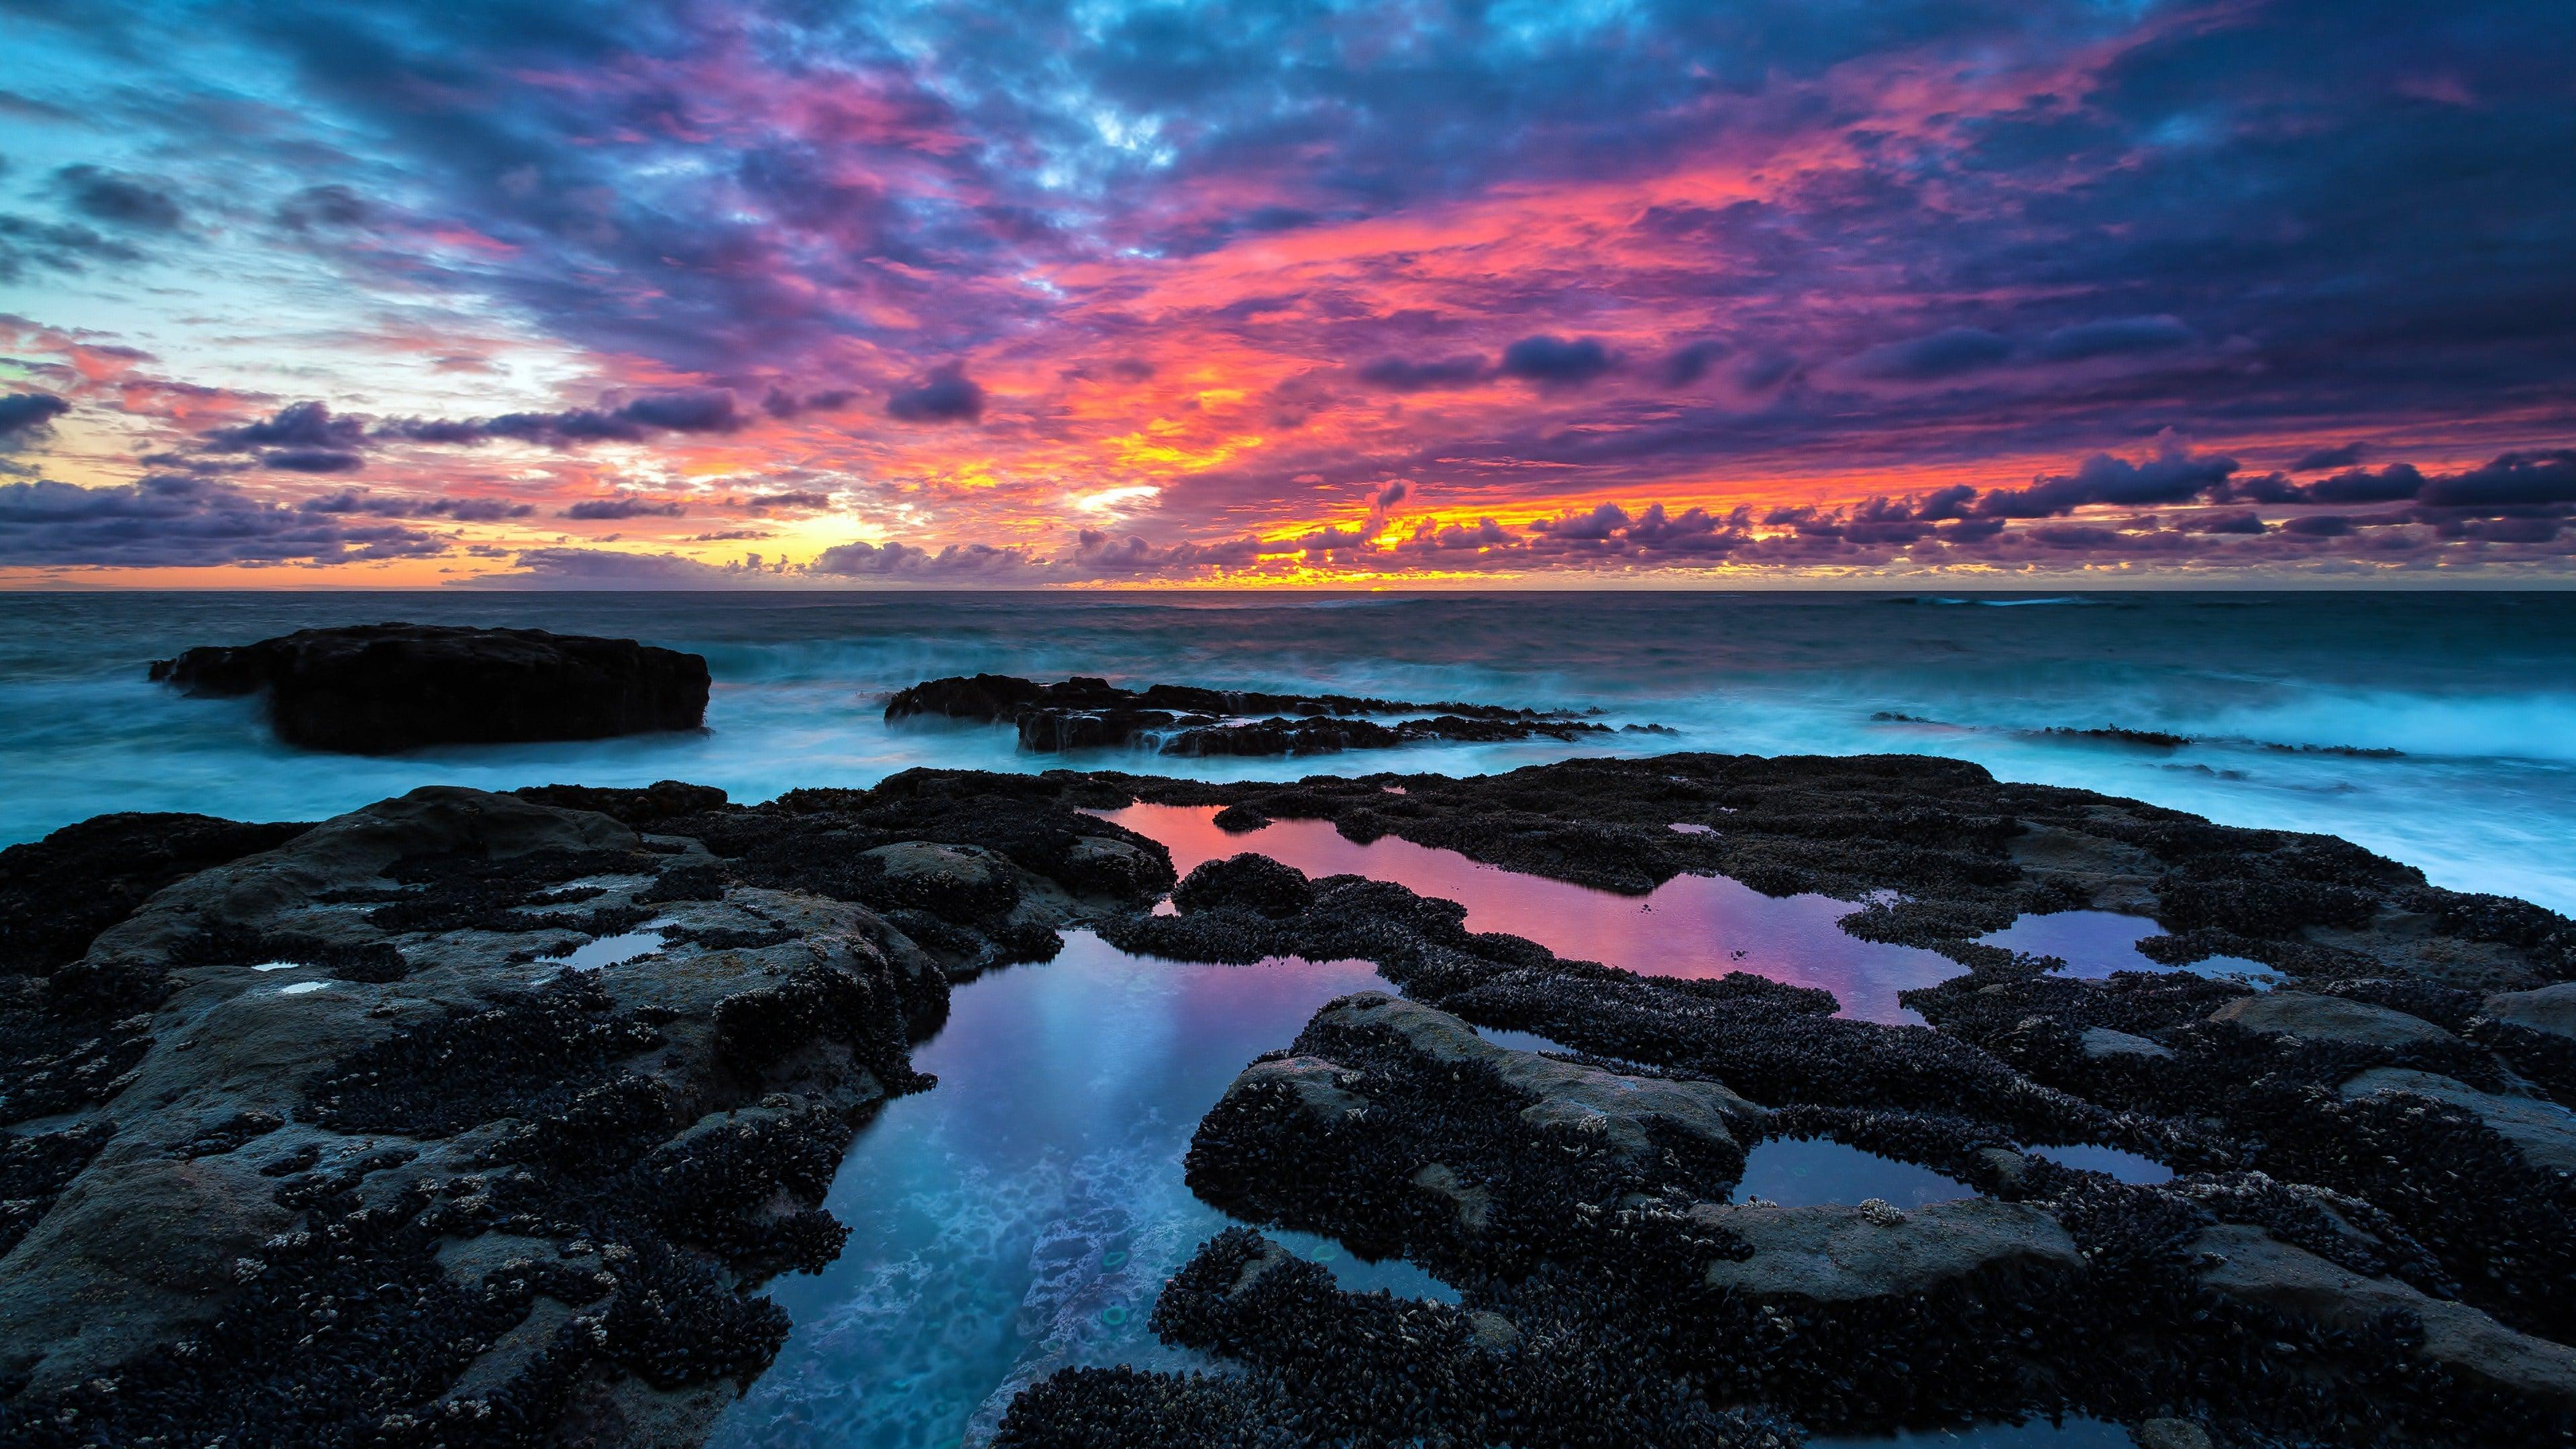 Sunset HD pics